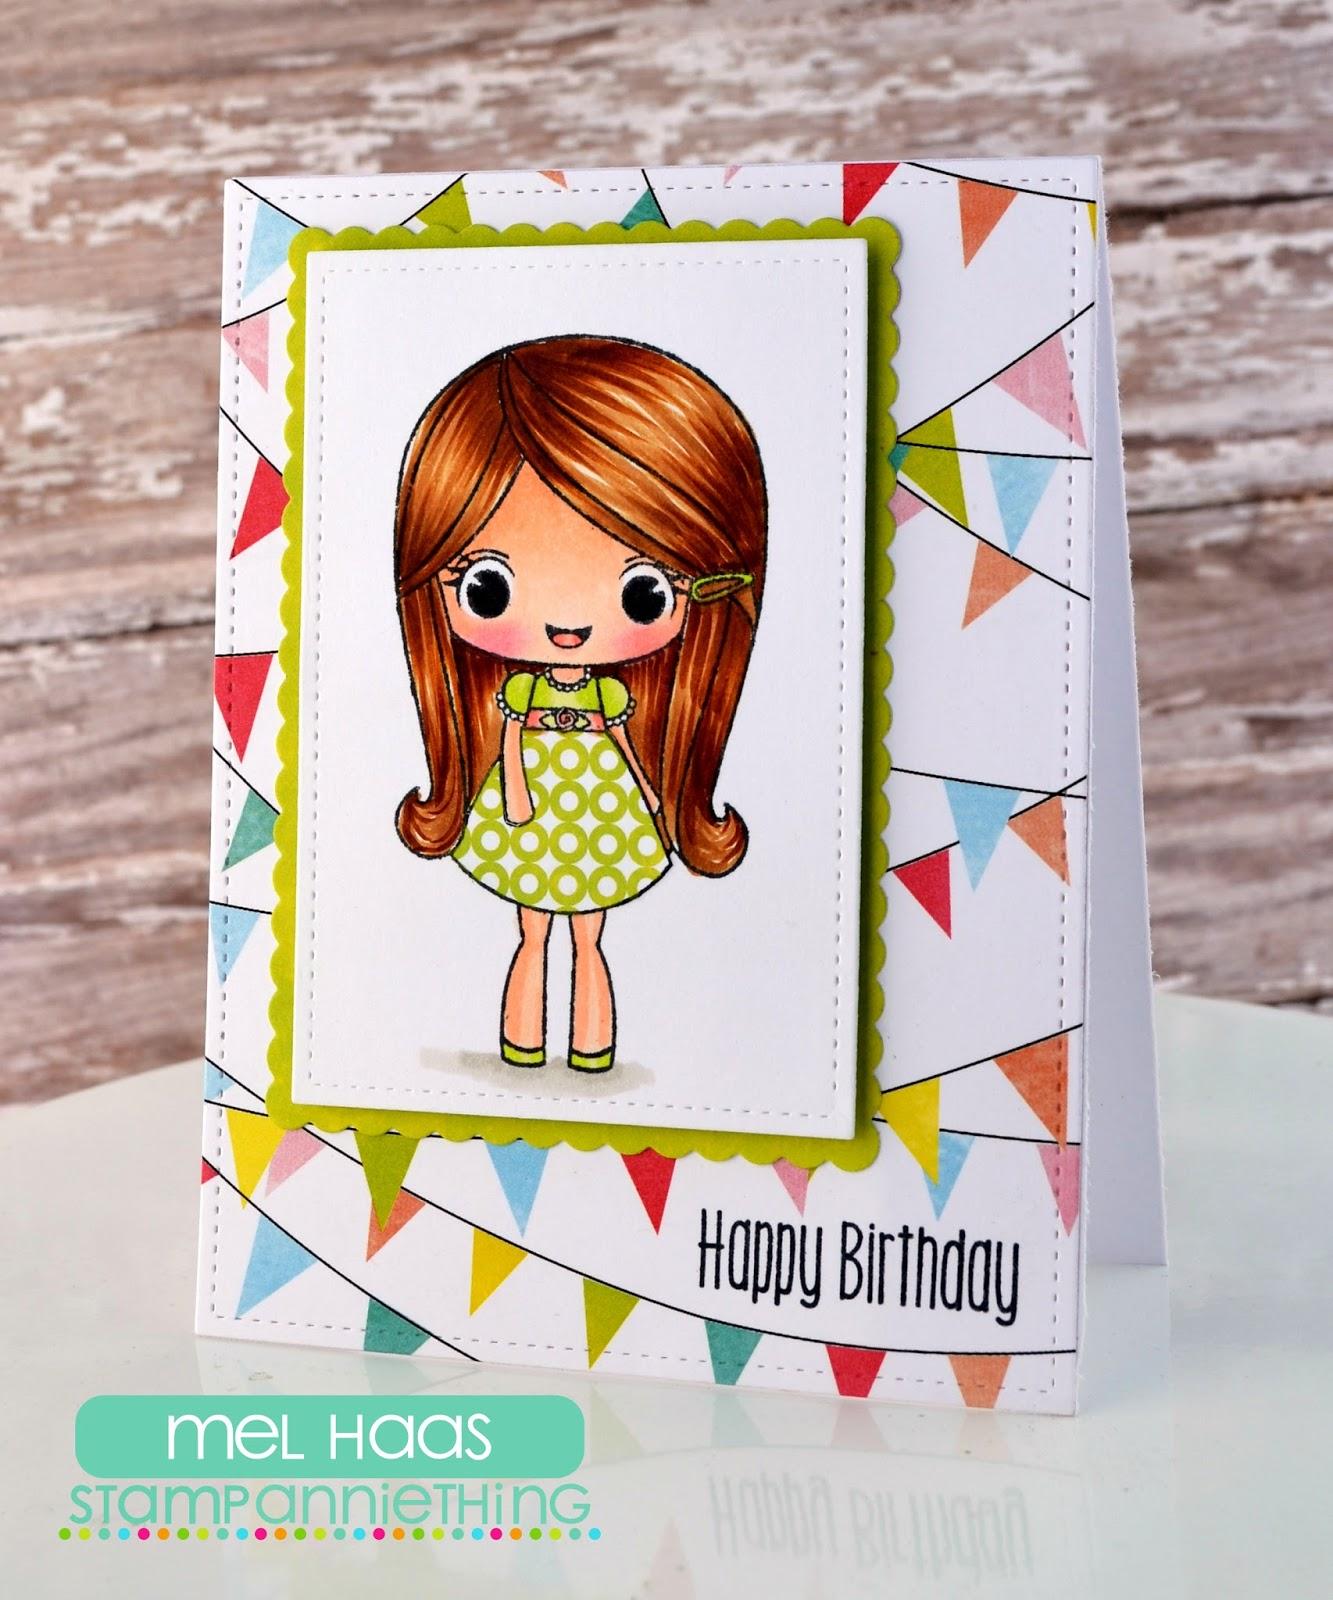 Stamp Annie Thing Birthday Greetings From Melanie